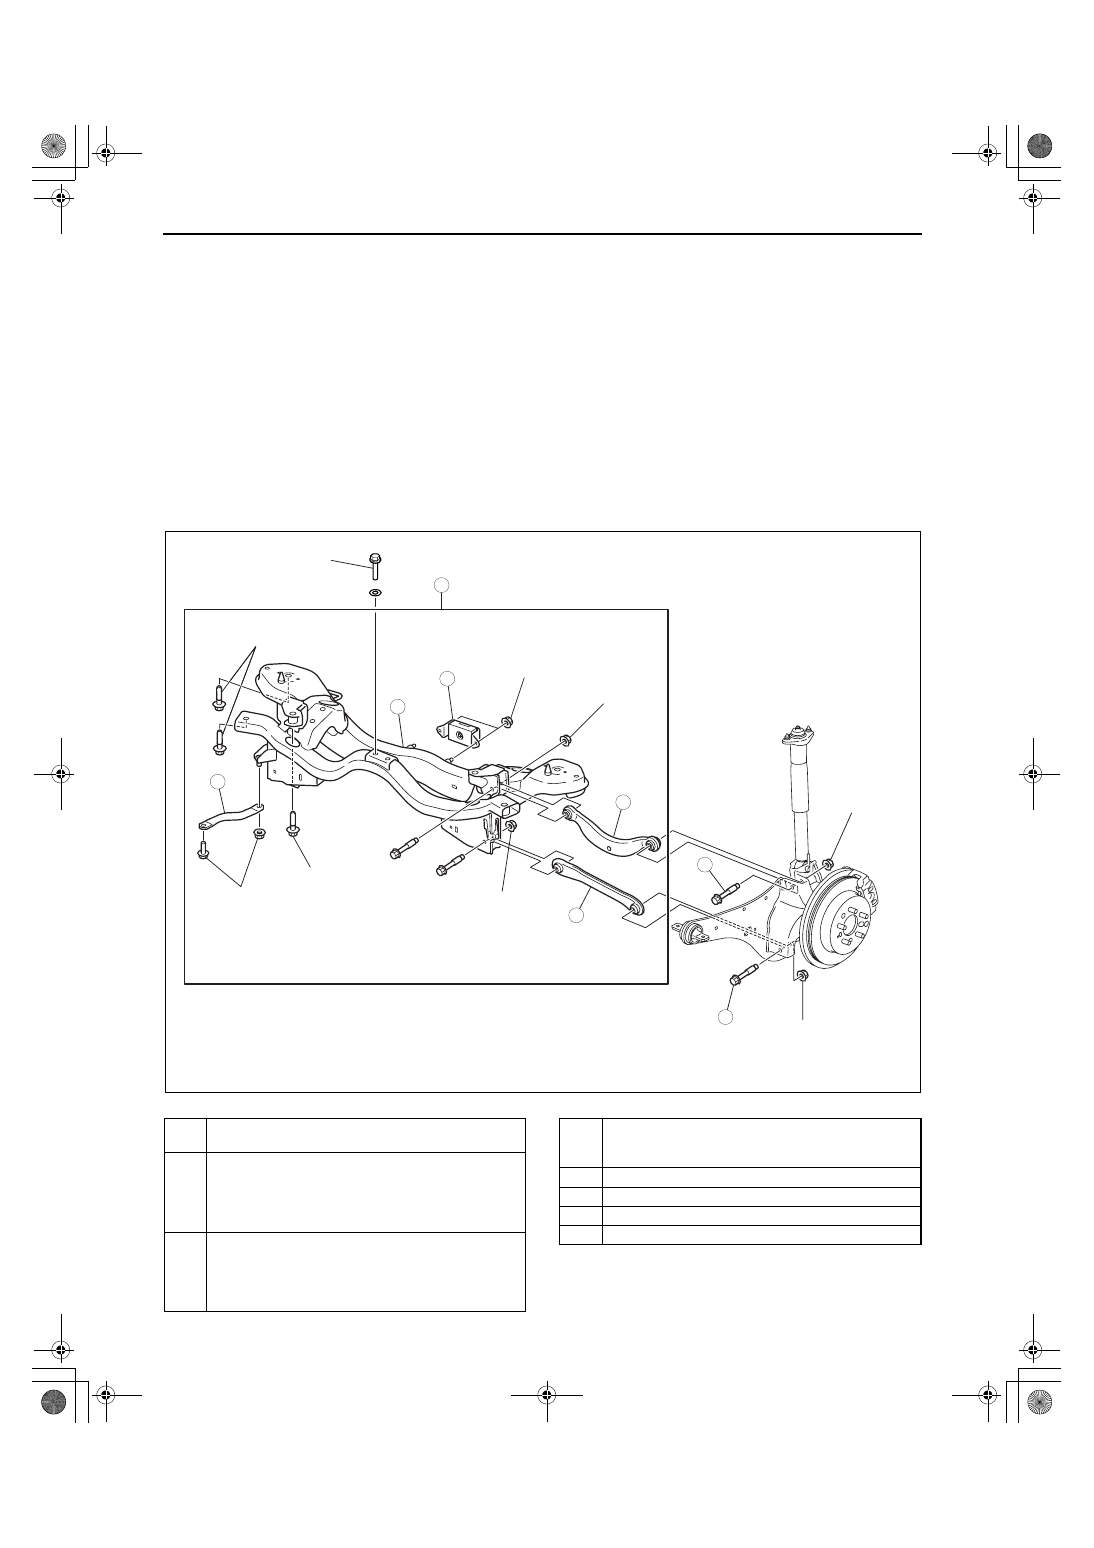 Mazda 3 Service Manual: Rear Trailing Link RemovalInstallation